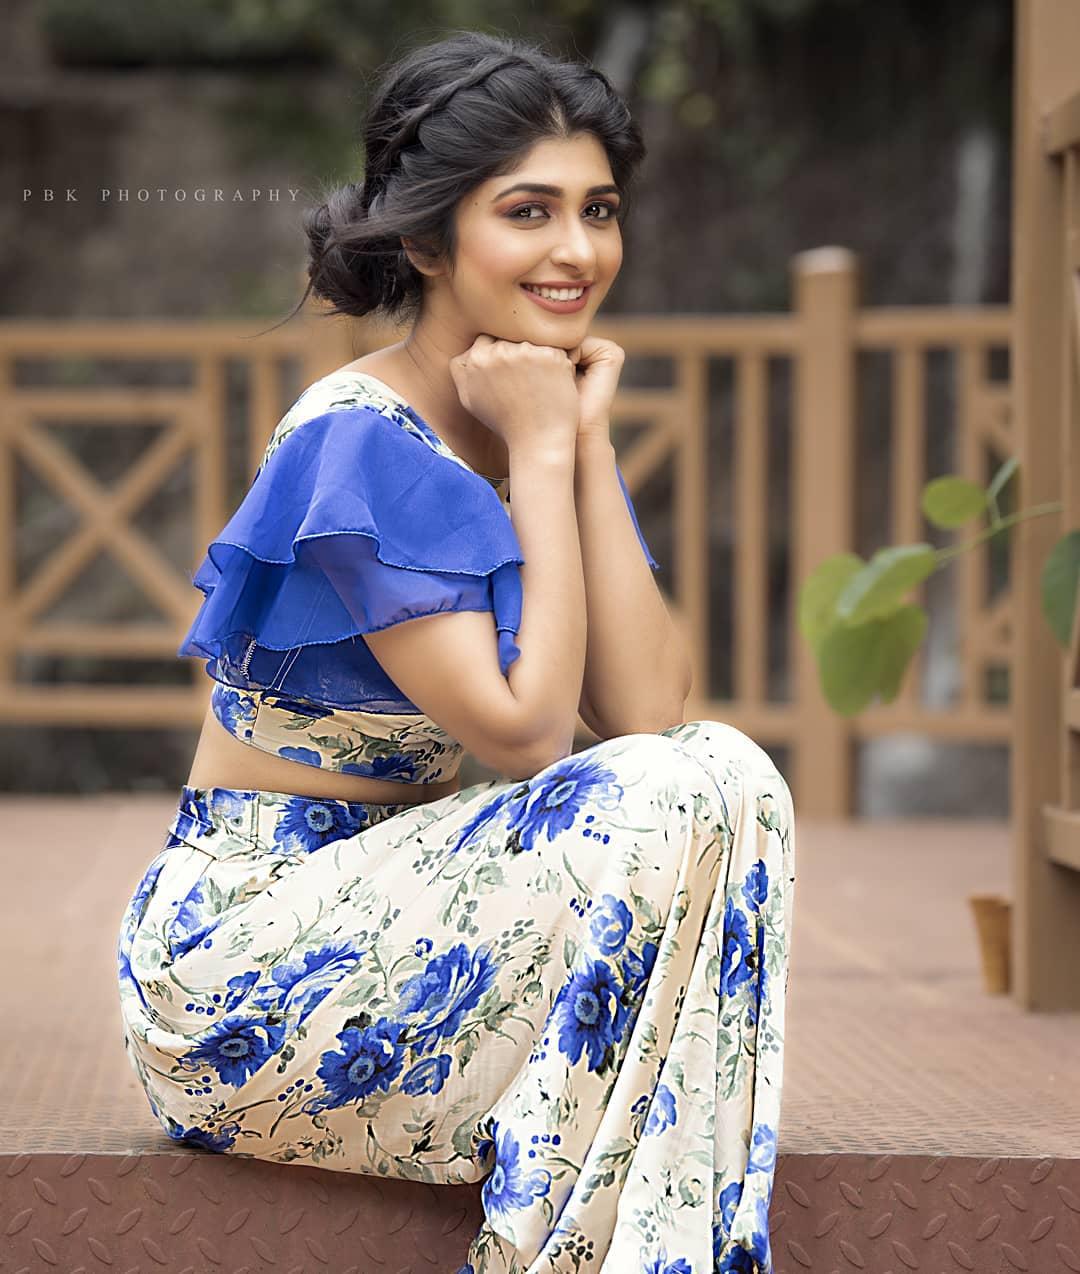 Sandalwood beauty Aditi Prabhudeva' stunning Photo Gallery! 6